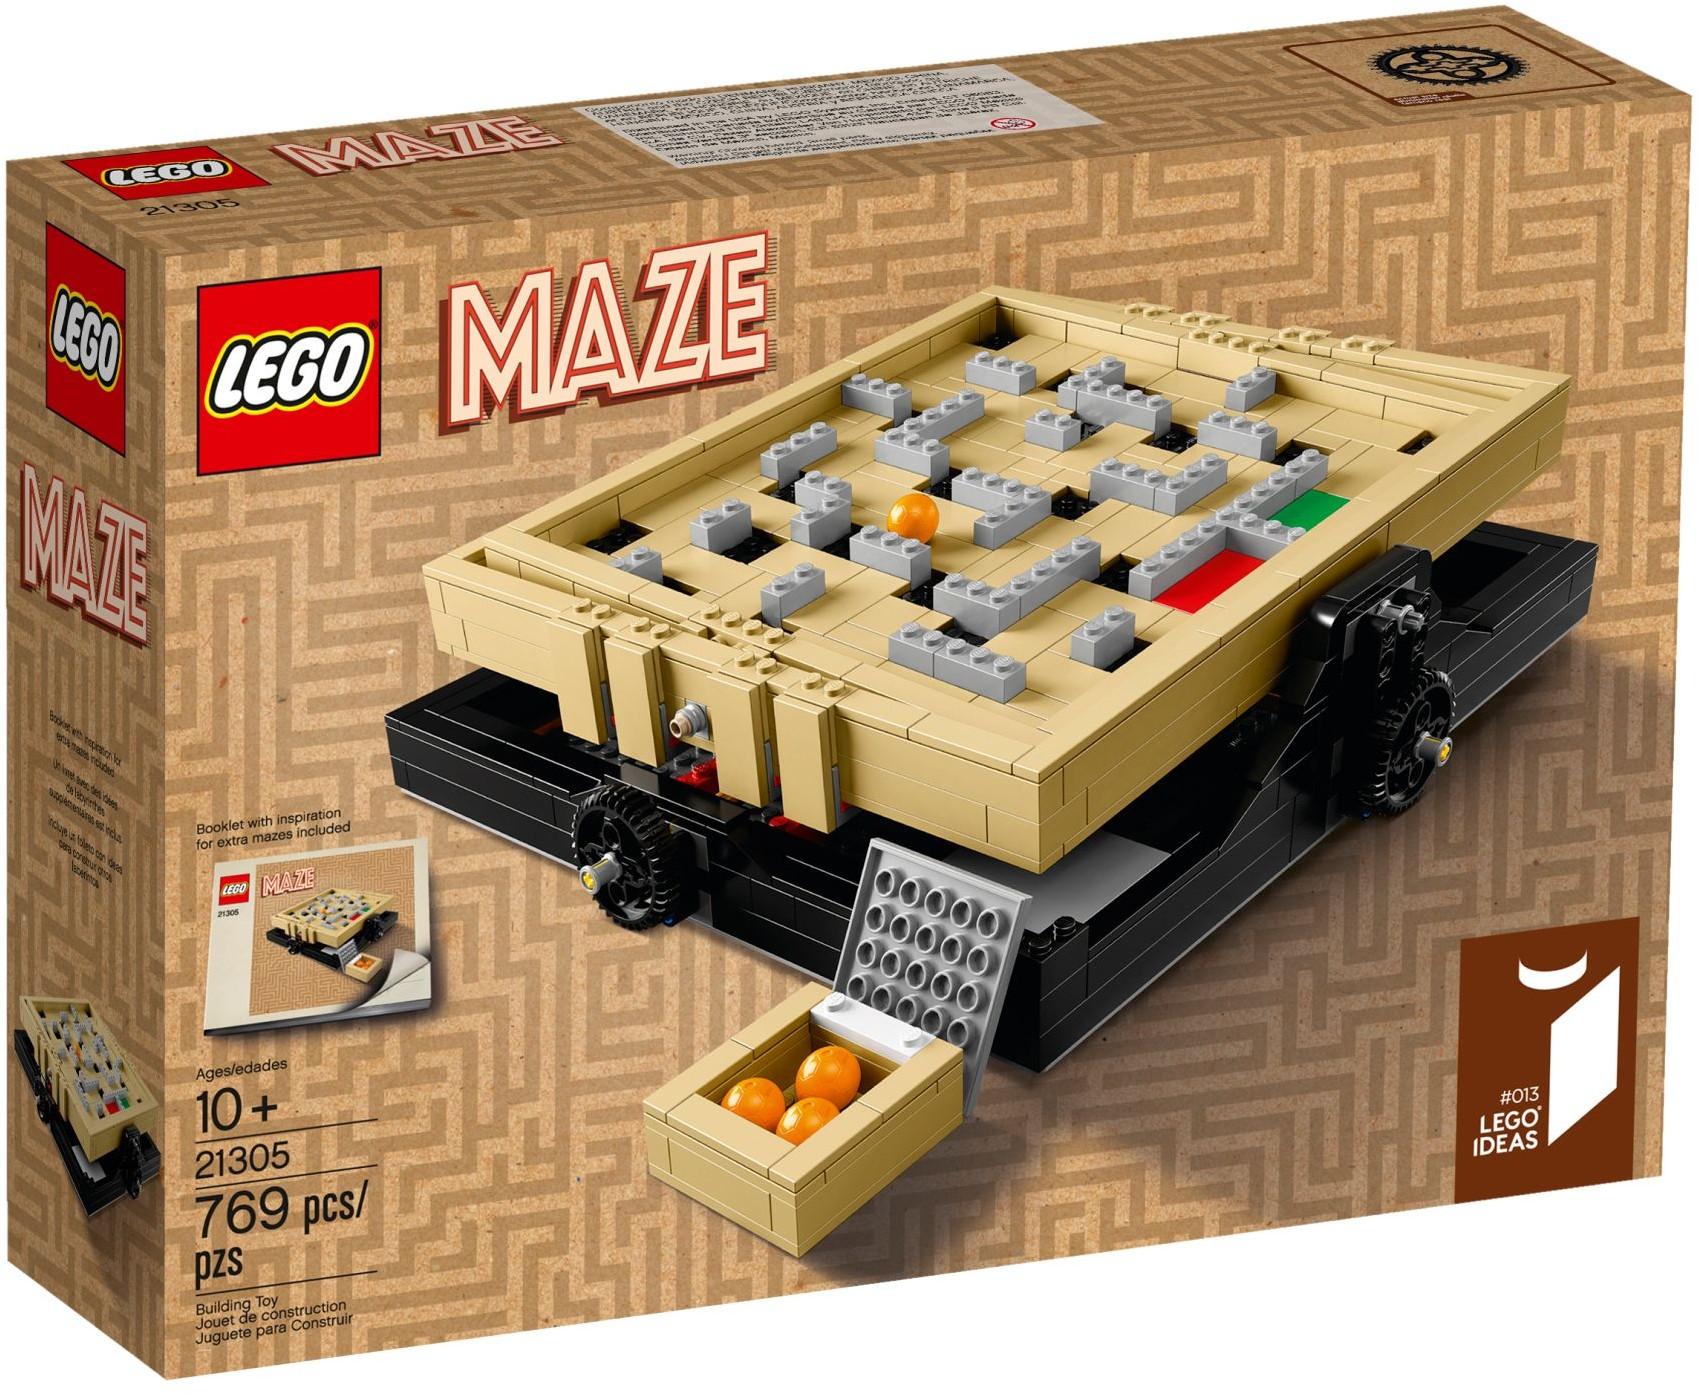 LEGO 21305 - CUUSO / Ideas - Maze